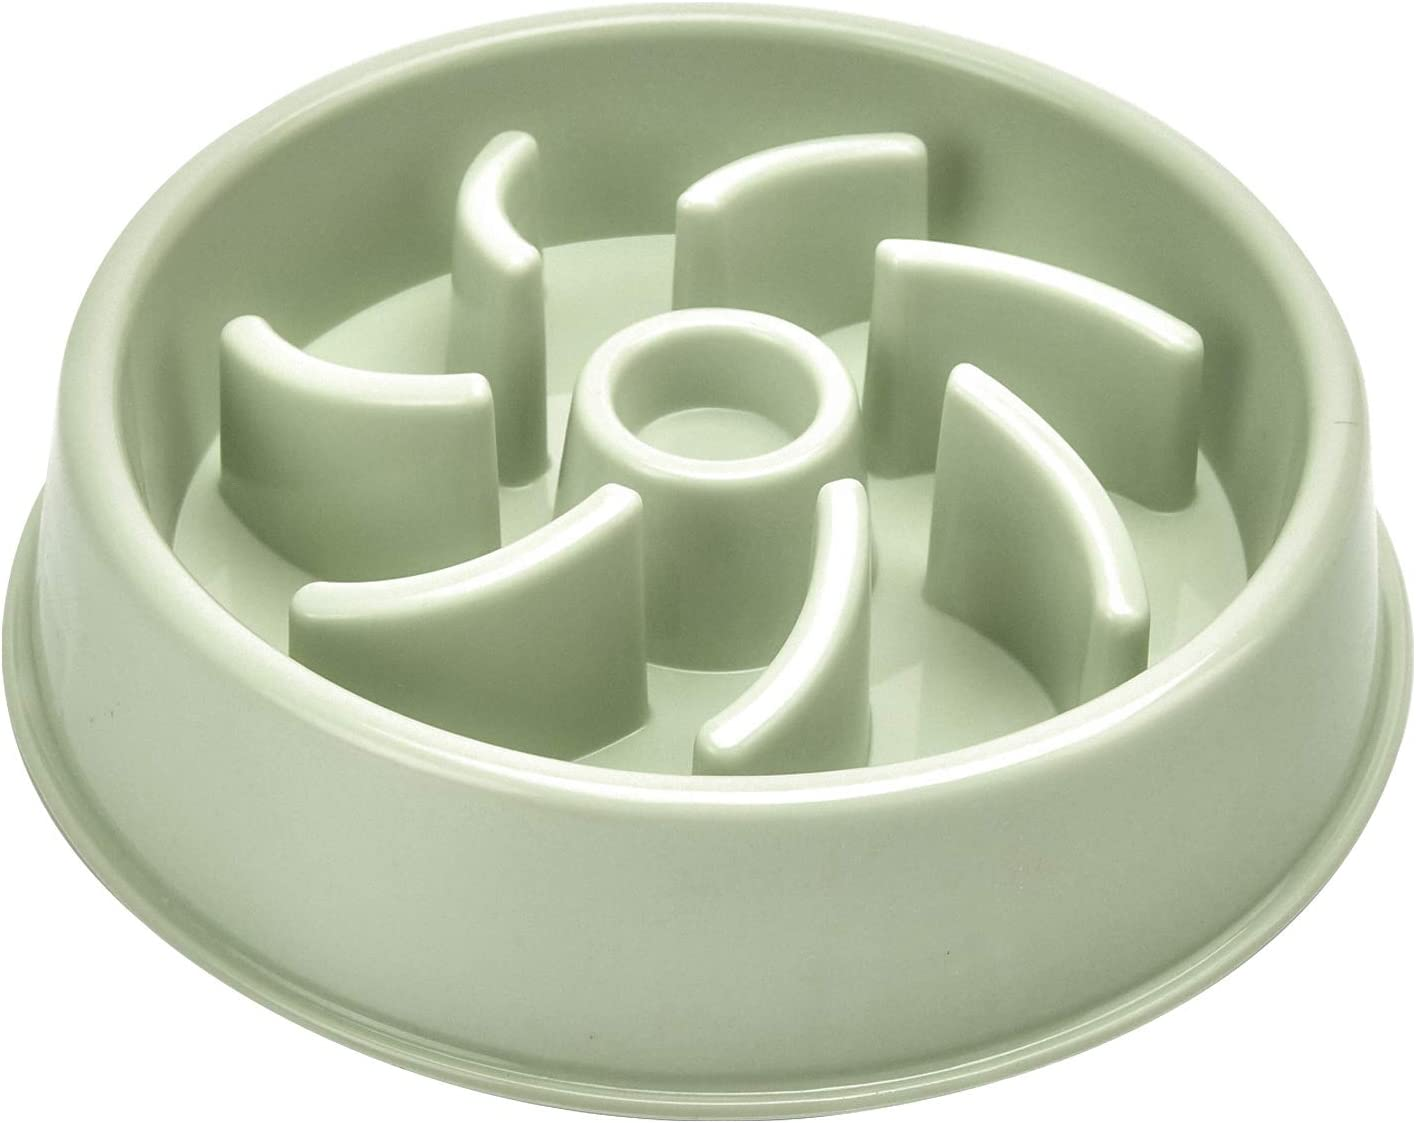 TANDD Slow Feeder Bowl, Anti-Choke Pet Bowls, Pets Water Bowl, Healthy Food Fun for Dog/Puppy